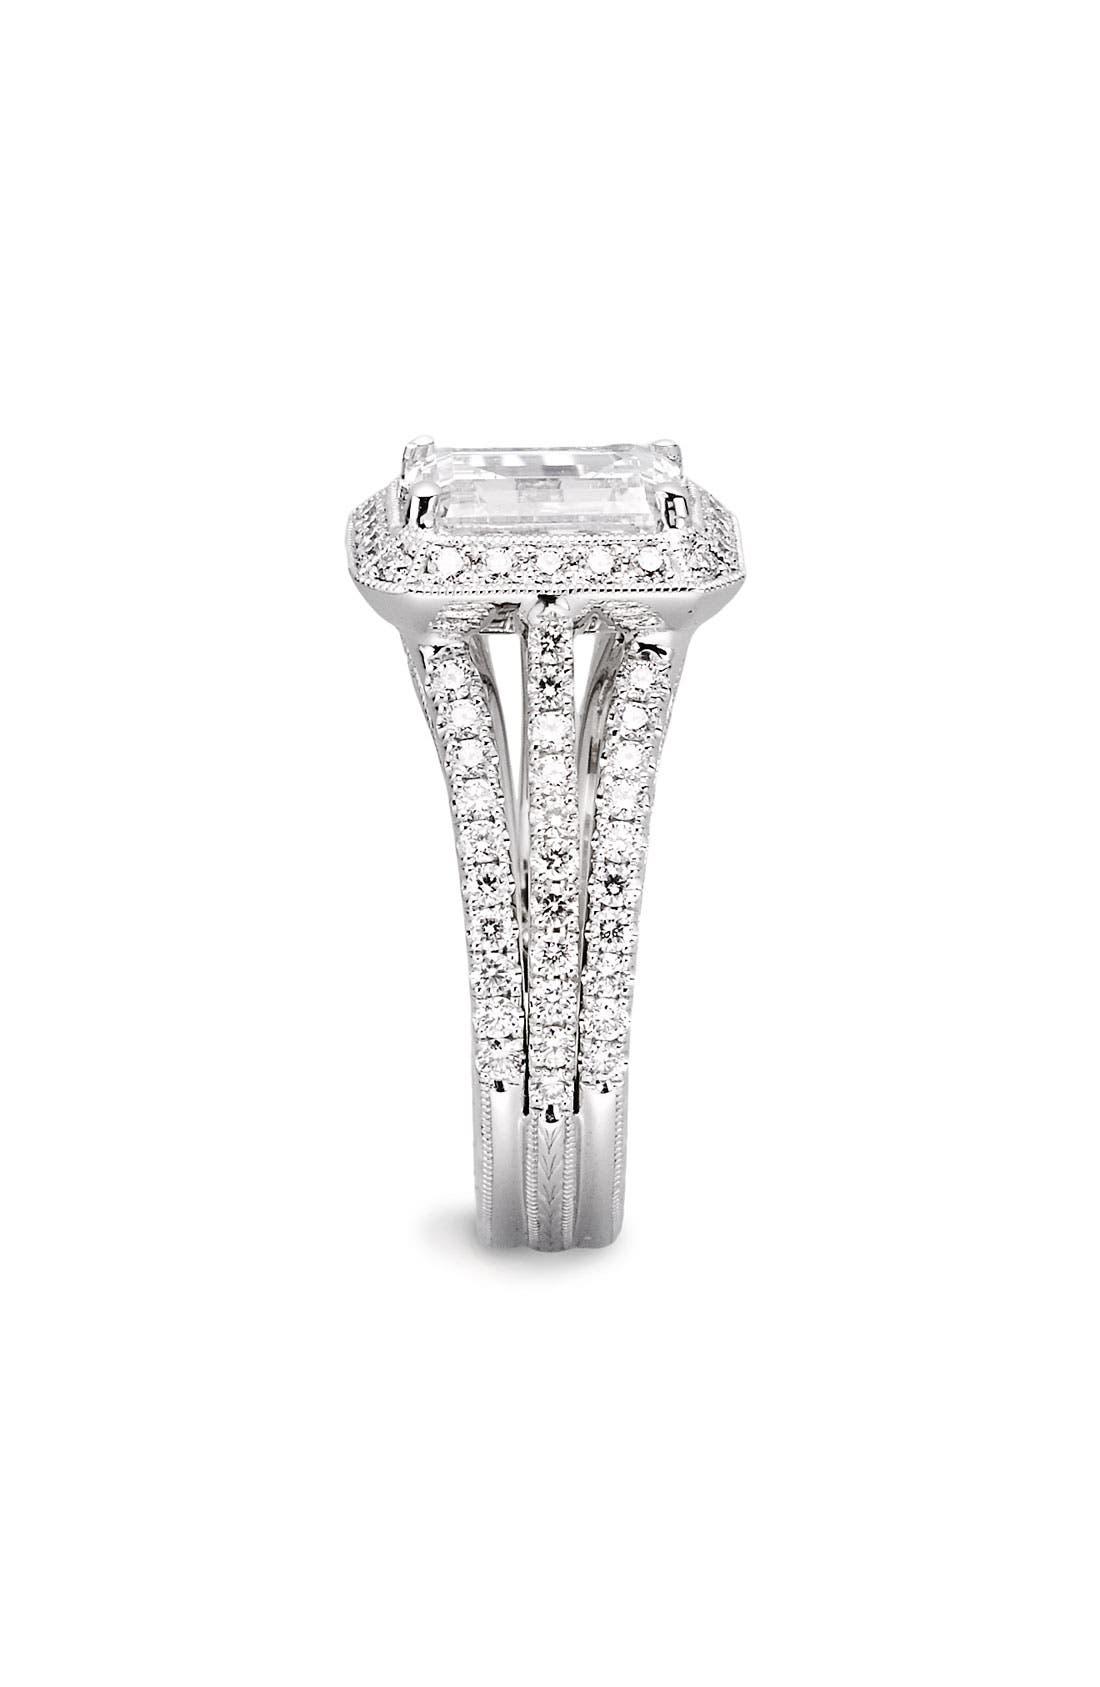 Alternate Image 2  - Jack Kelége 'Romance' Emerald Cut Diamond Engagement Ring Setting